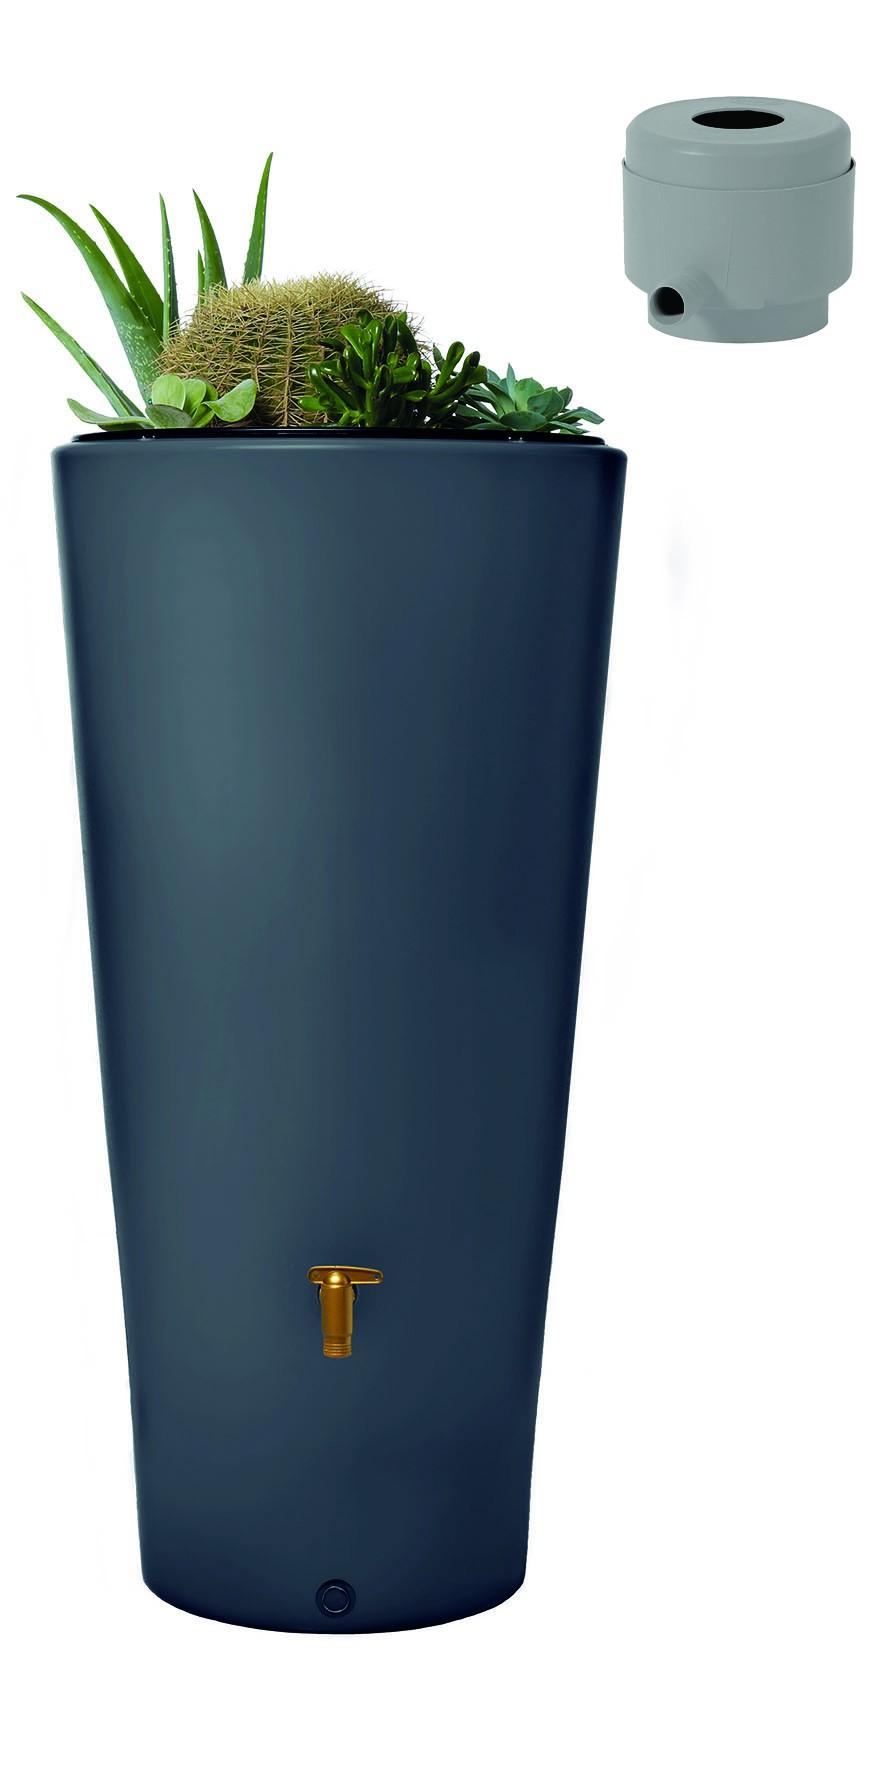 Kit reservoir 2 en 1 VASO 220 litres gris graphite-01